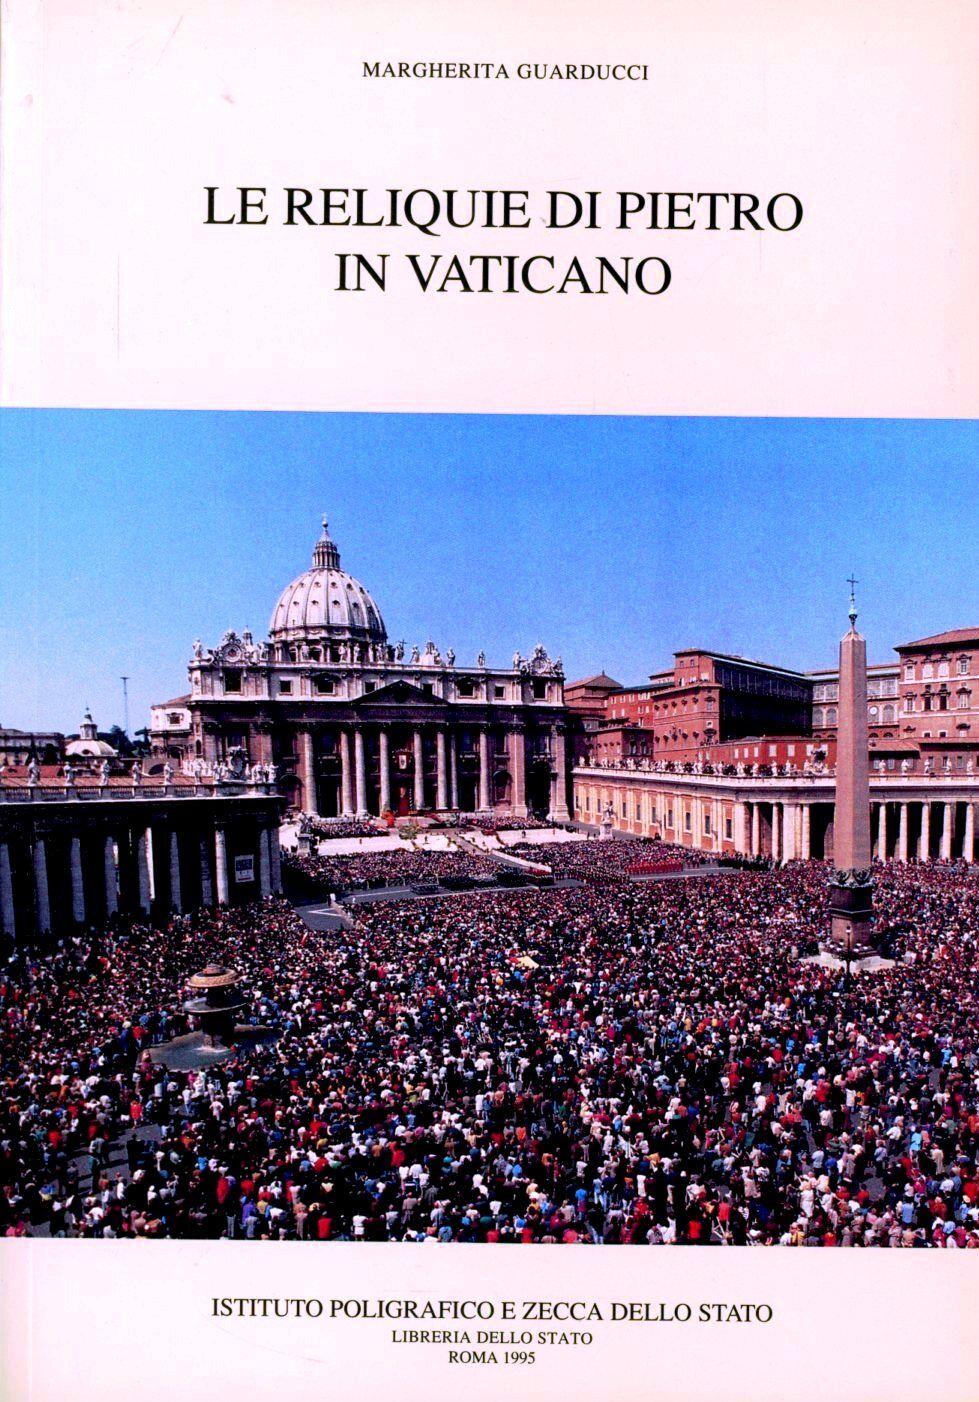 Le reliquie di Pietro in Vaticano